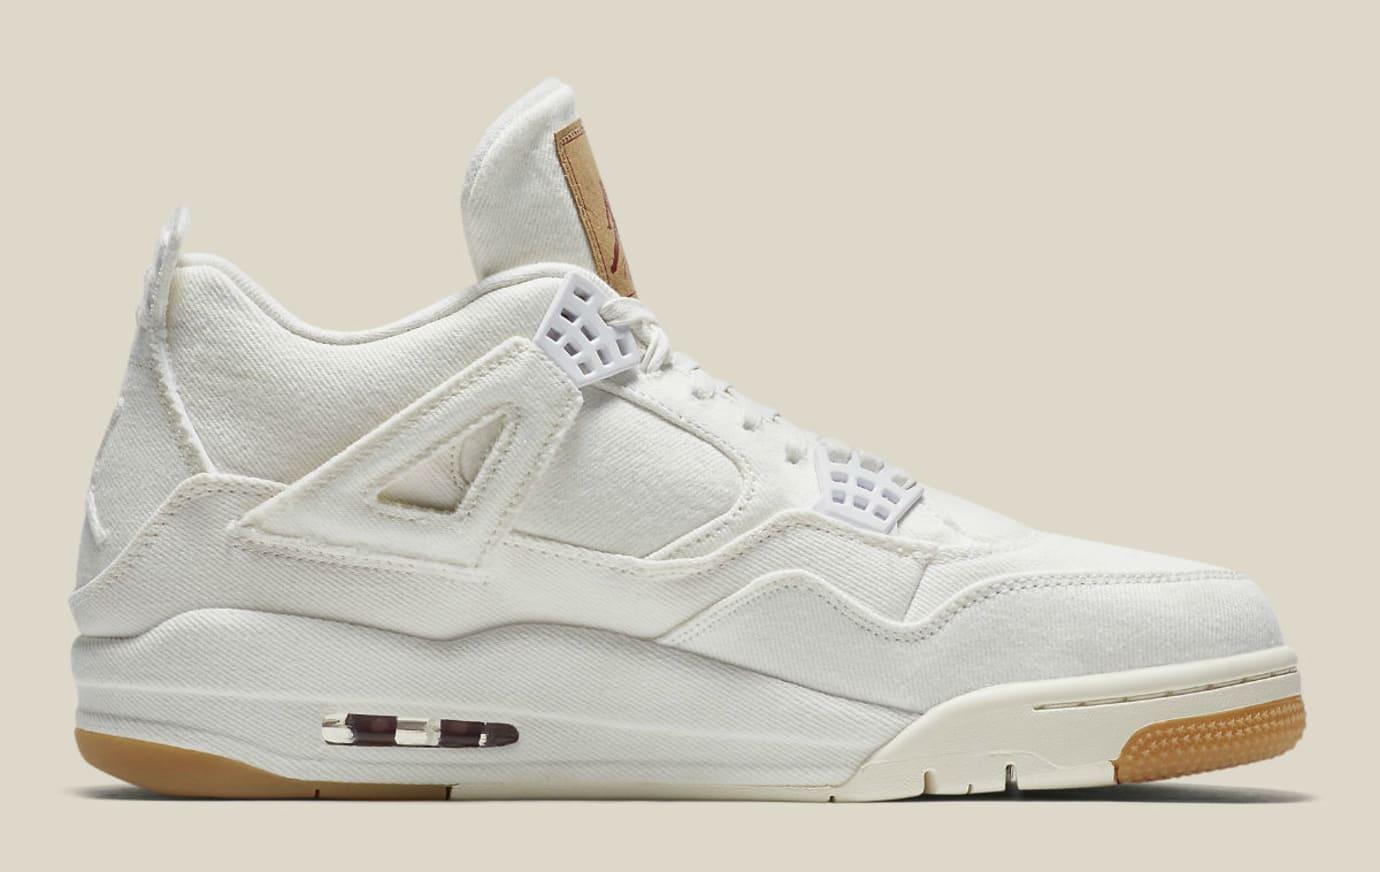 2ca58e1c4d84 Image via Nike Levi s x Air Jordan 4 White Demin Release Date AO2571-100  Medial